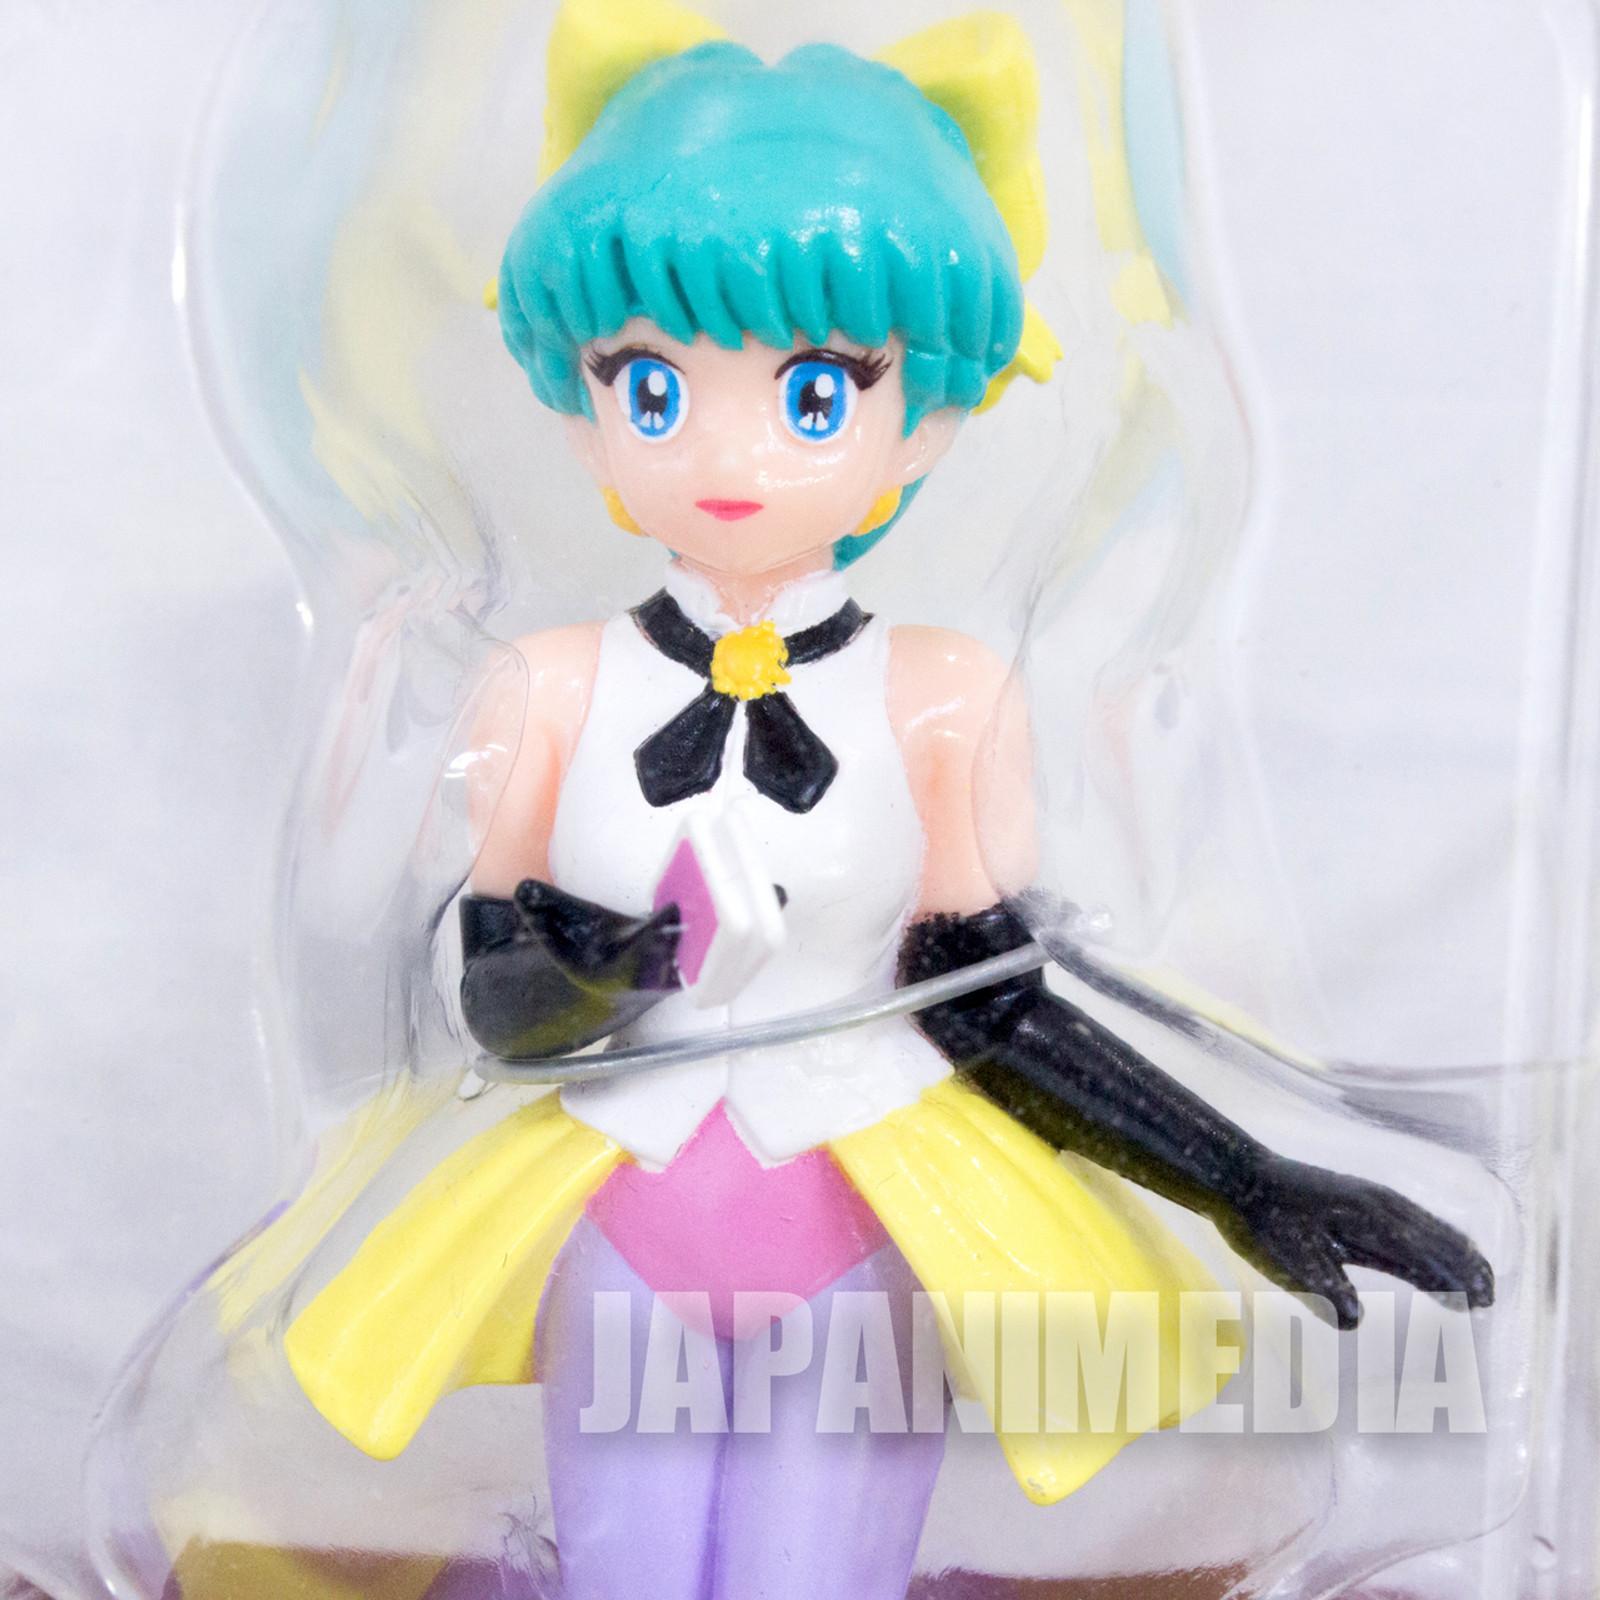 Magical Star Magical Emi Collection Figure SEGA JAPAN ANIME